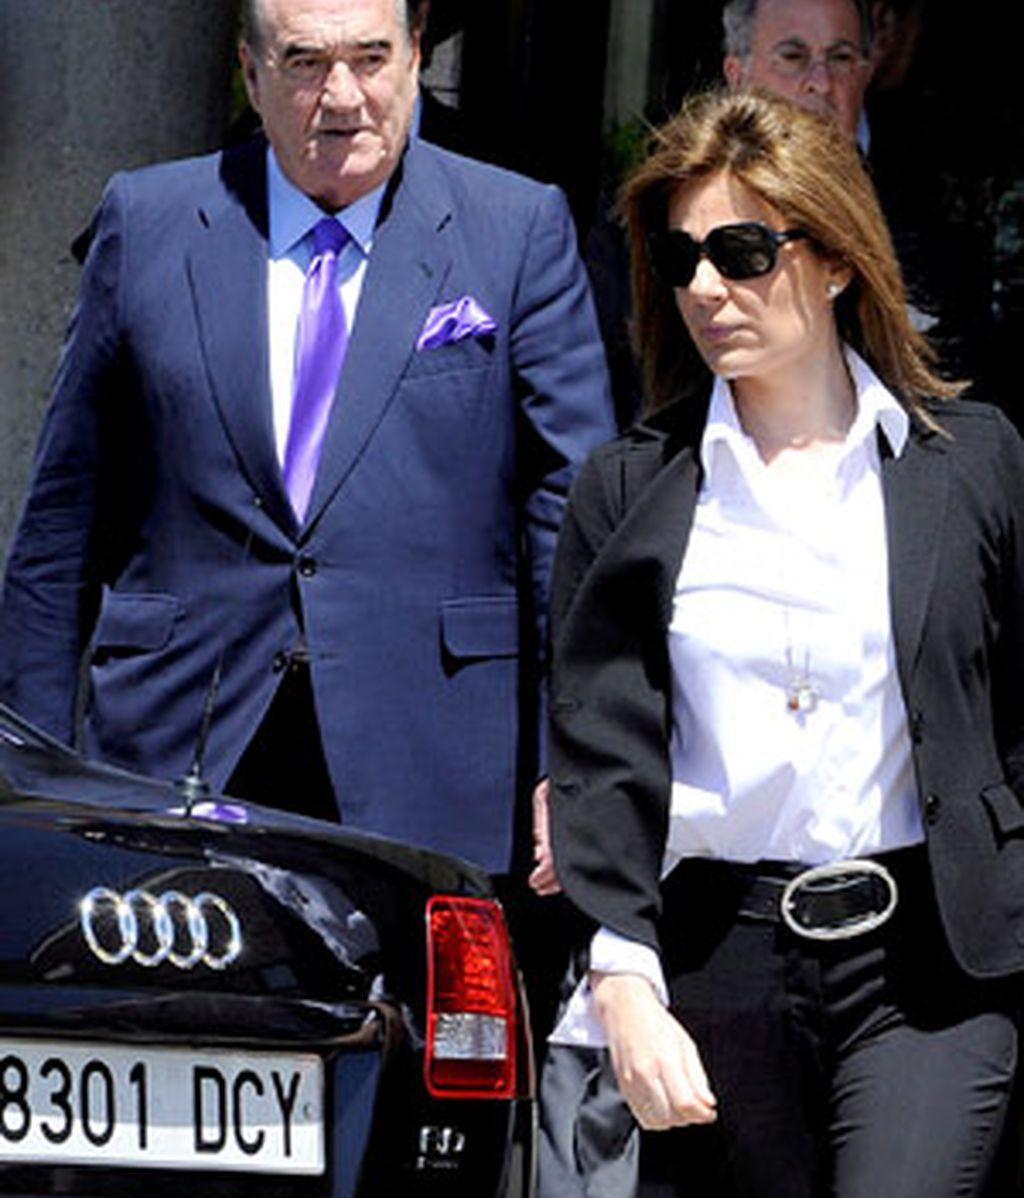 Nuria González y Fernando Fernández Tapia, en foto de Archivo. Foto: Gtres.